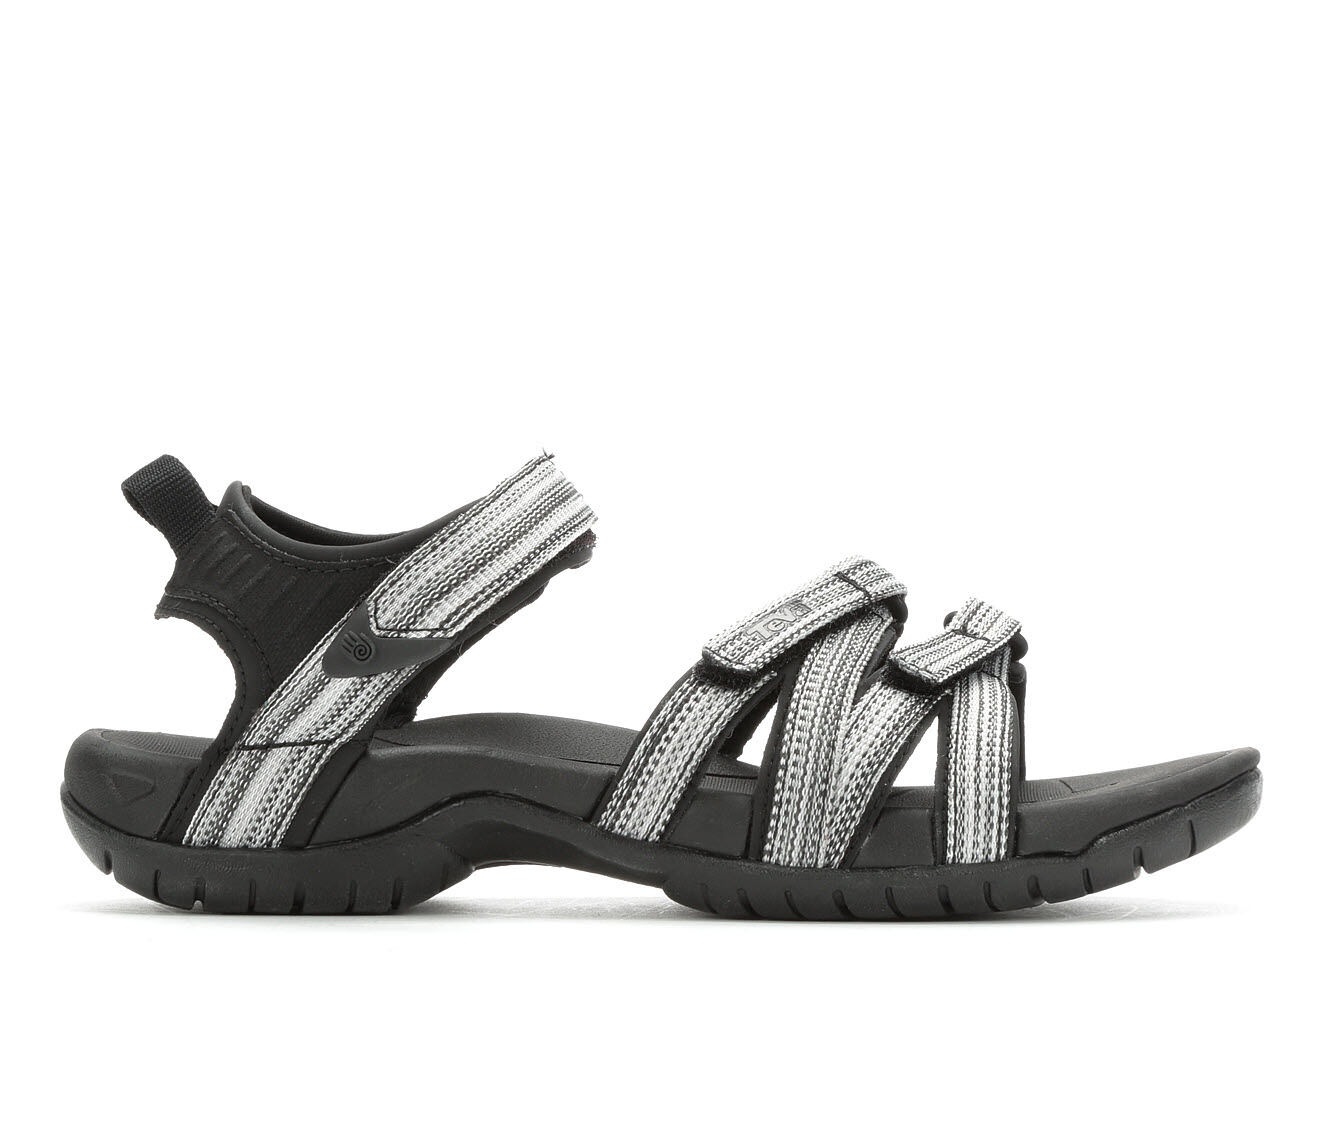 Best selling Women's Teva Tirra Outdoor Sandals Blk/Whte Multi